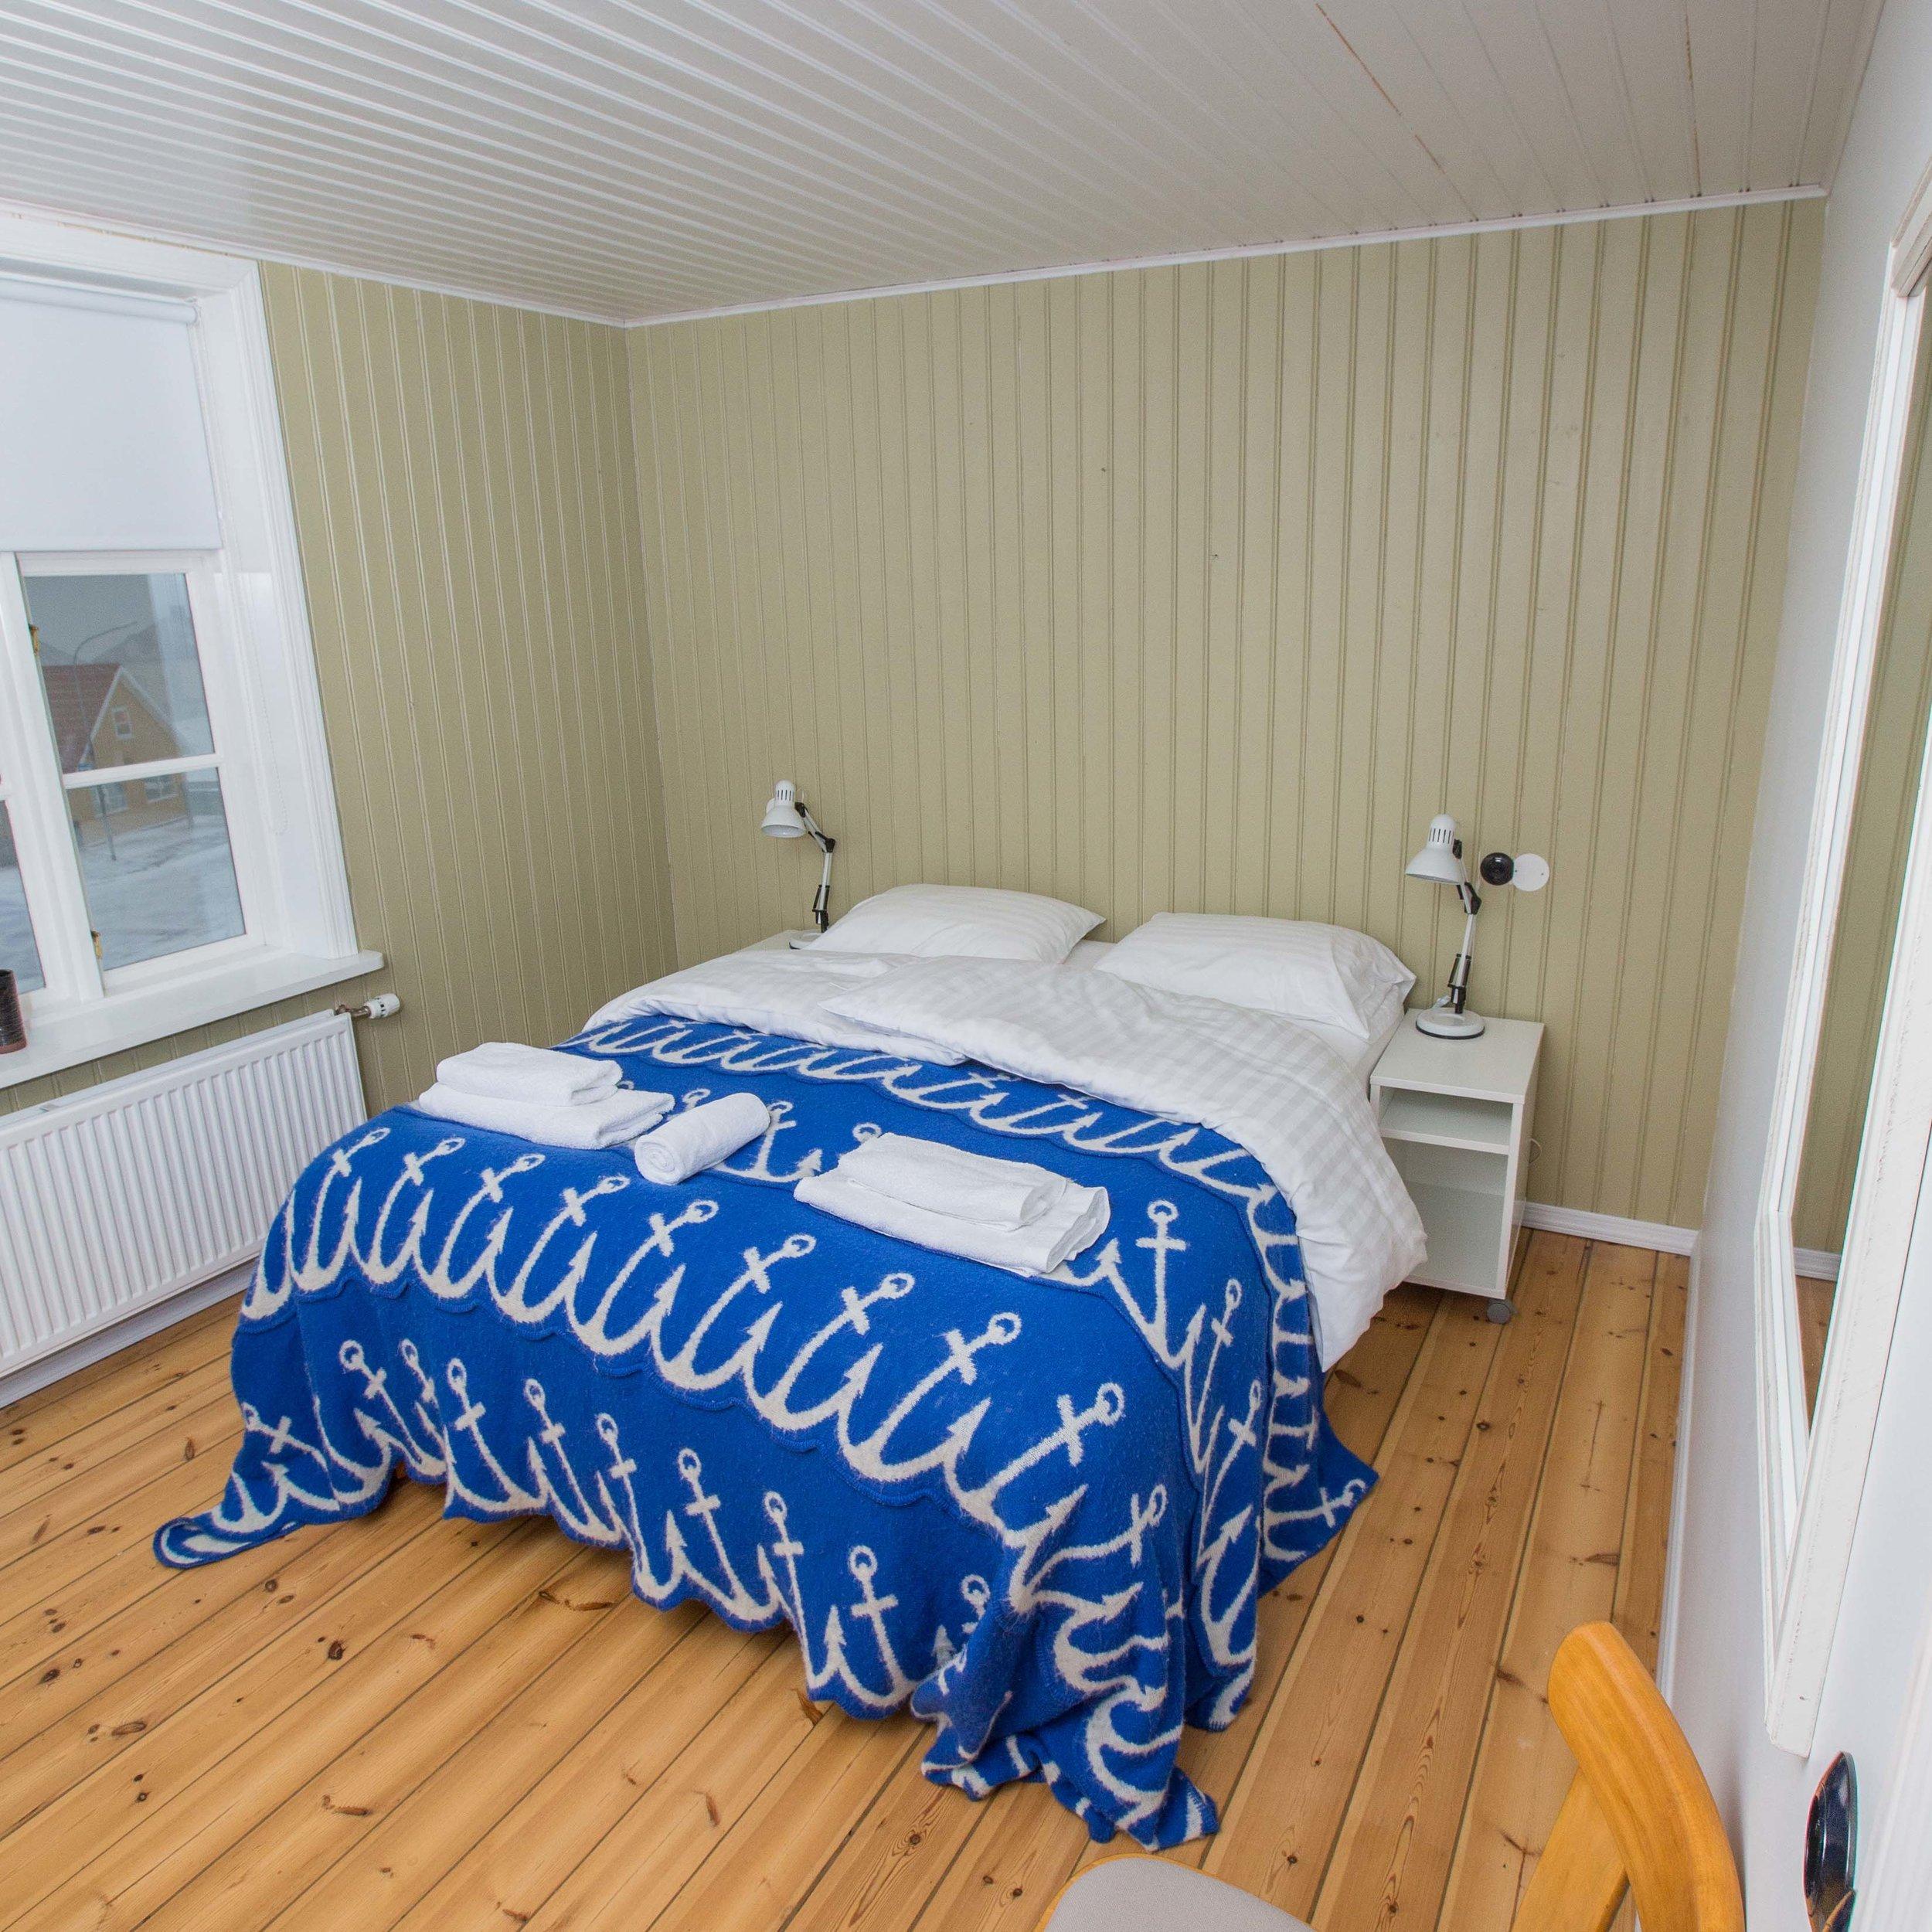 Room under renovation - Example photo